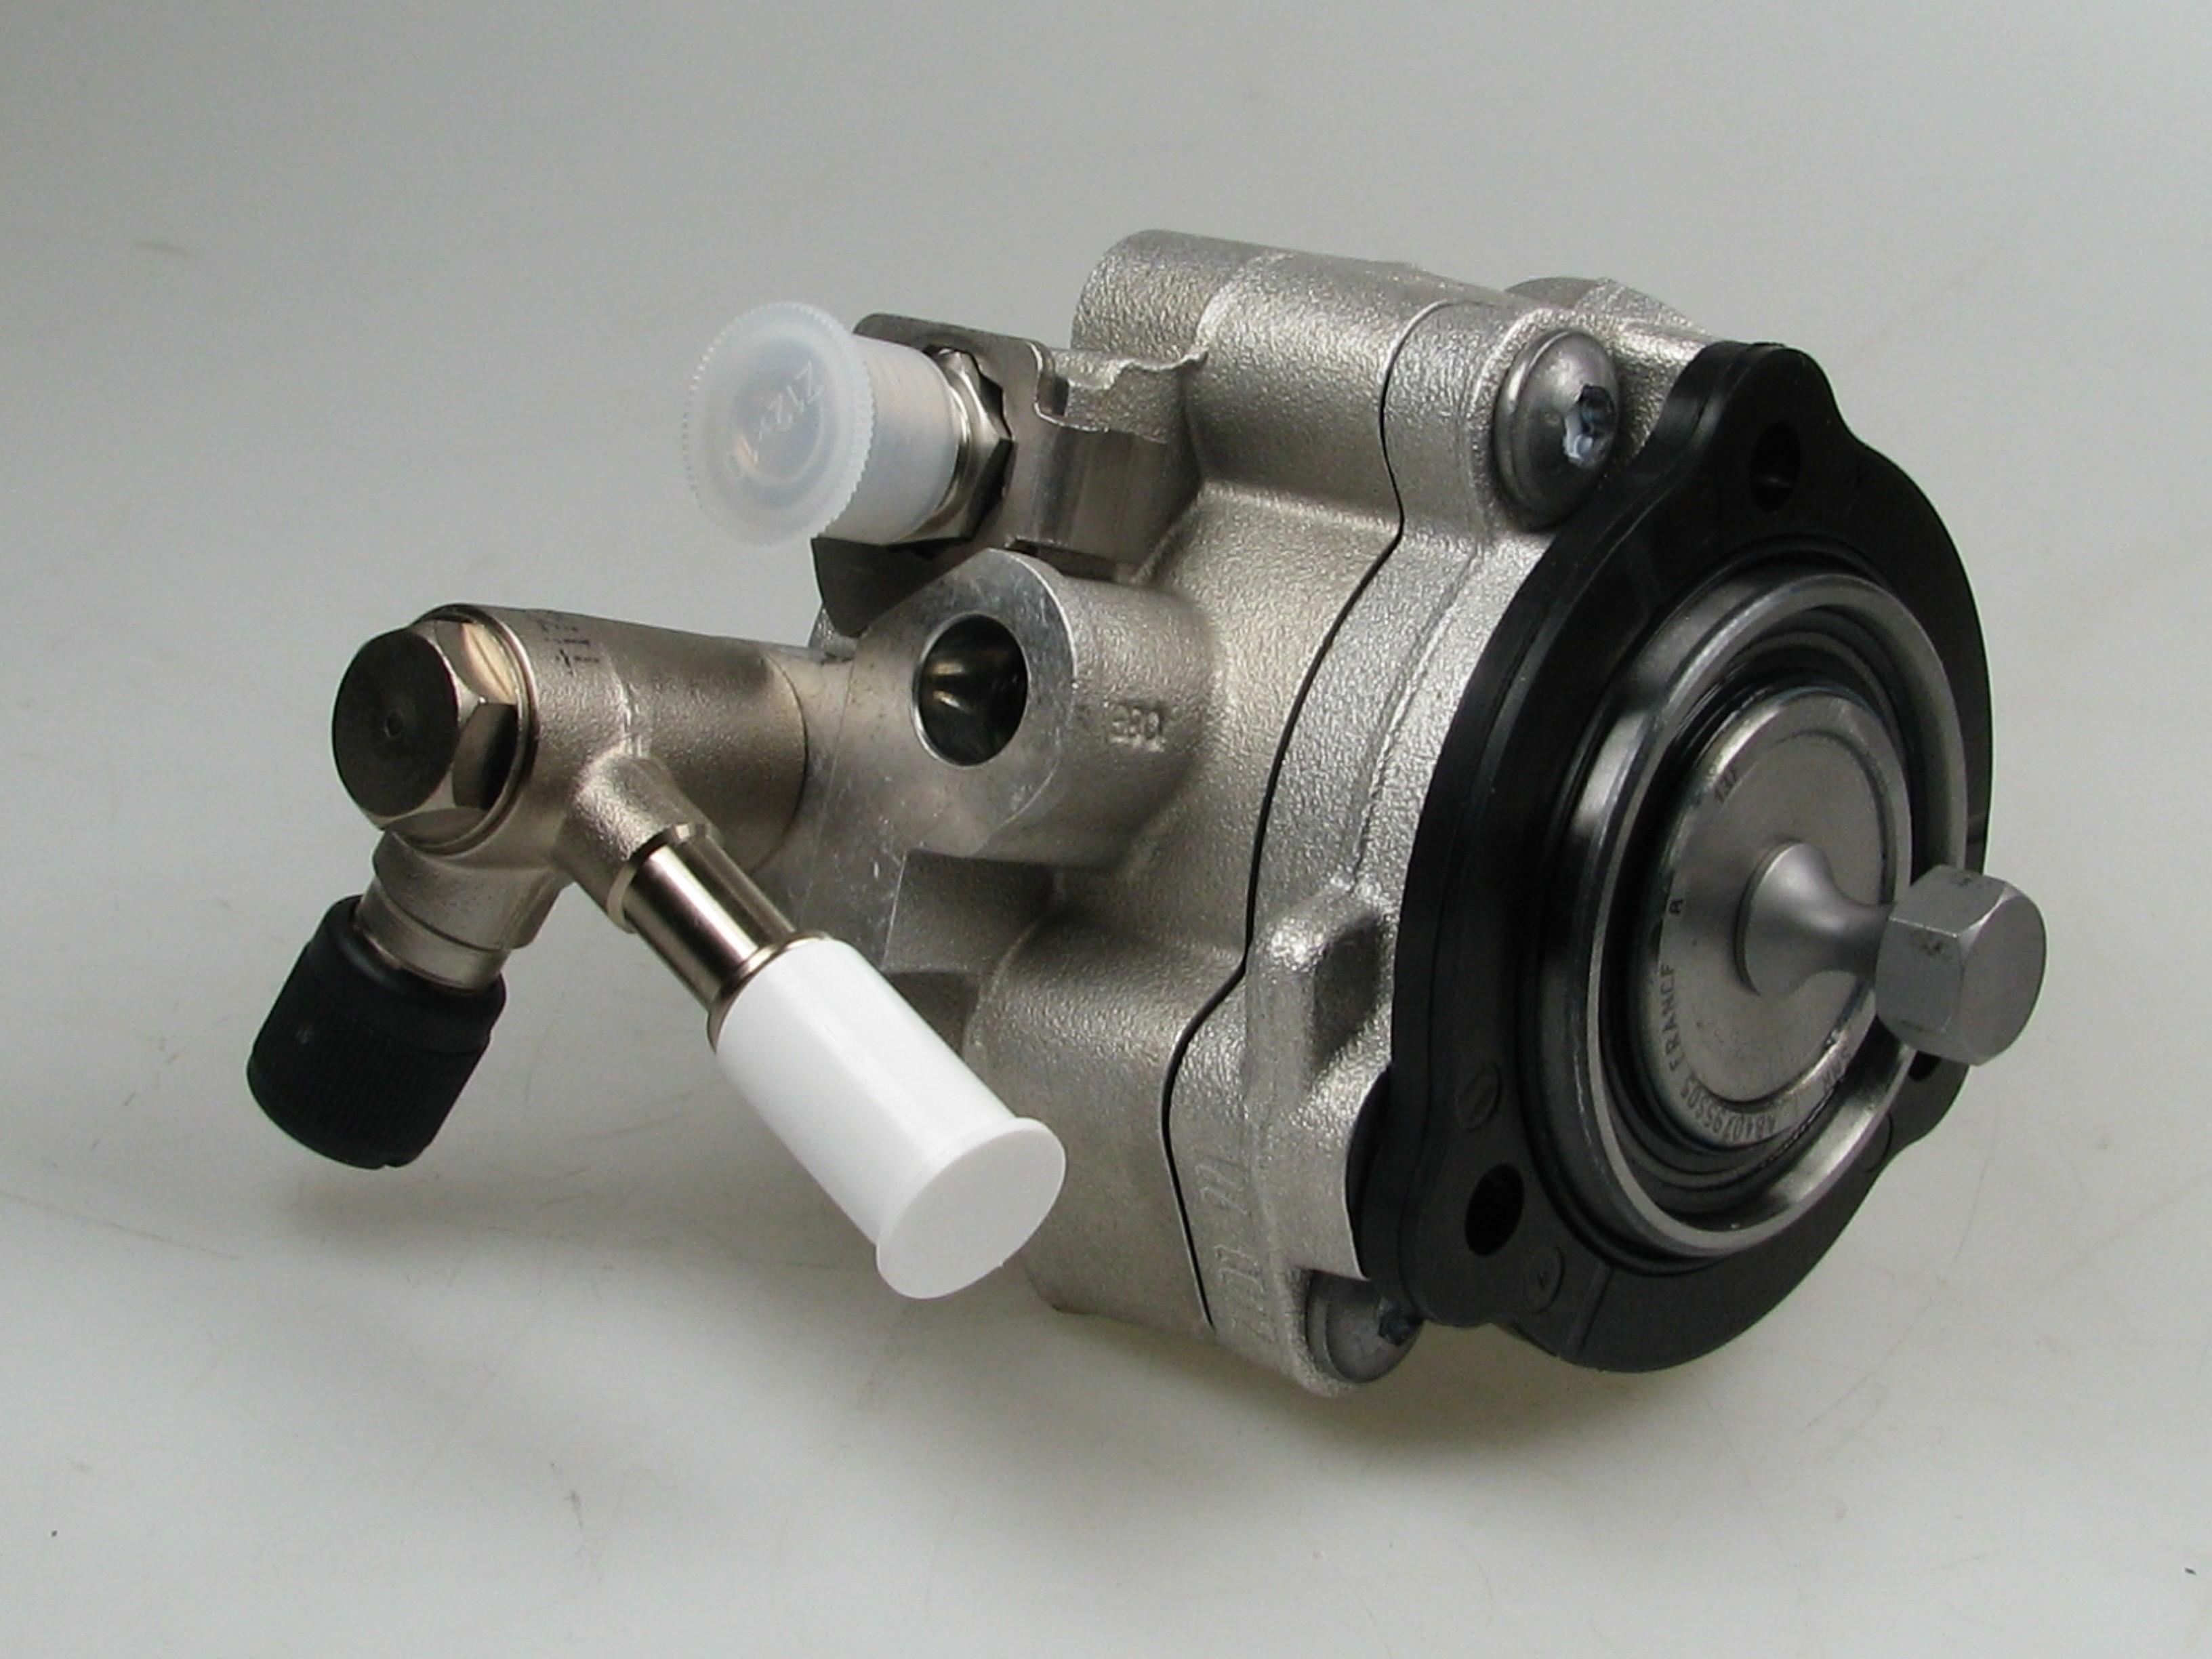 93174538 Genuine Gm Z22yh Petrol High Pressure Fuel Pump